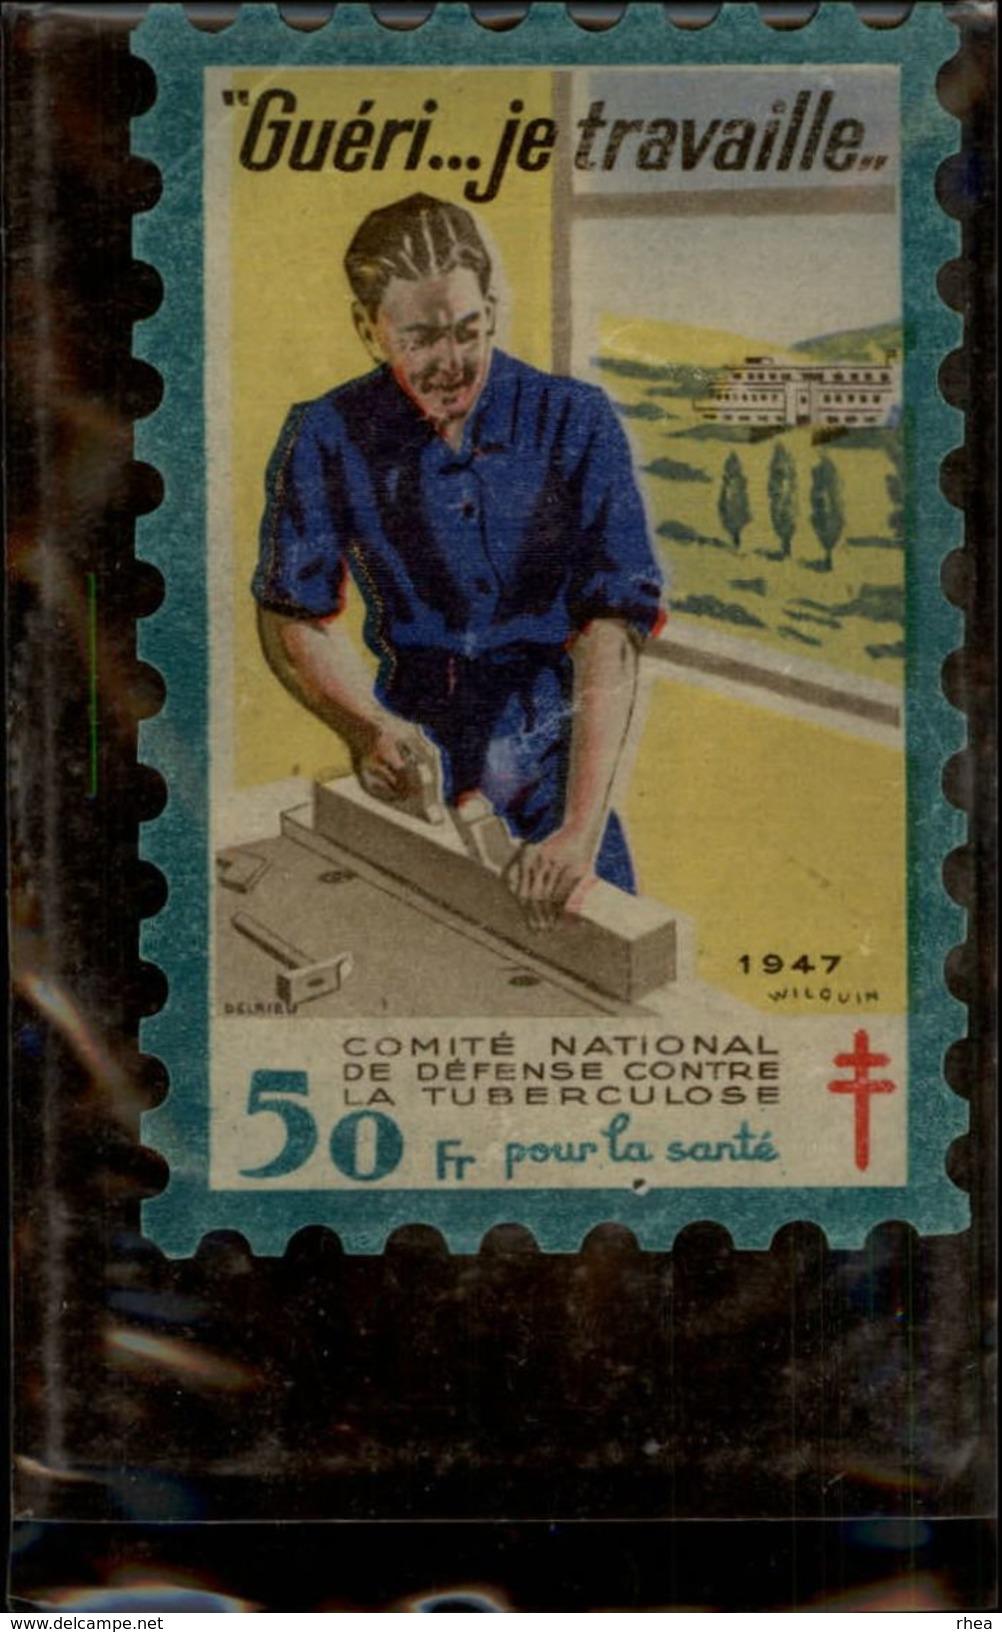 SANTE - Timbre Antiberculeux 1947 - Tuberculose - Erinnophilie